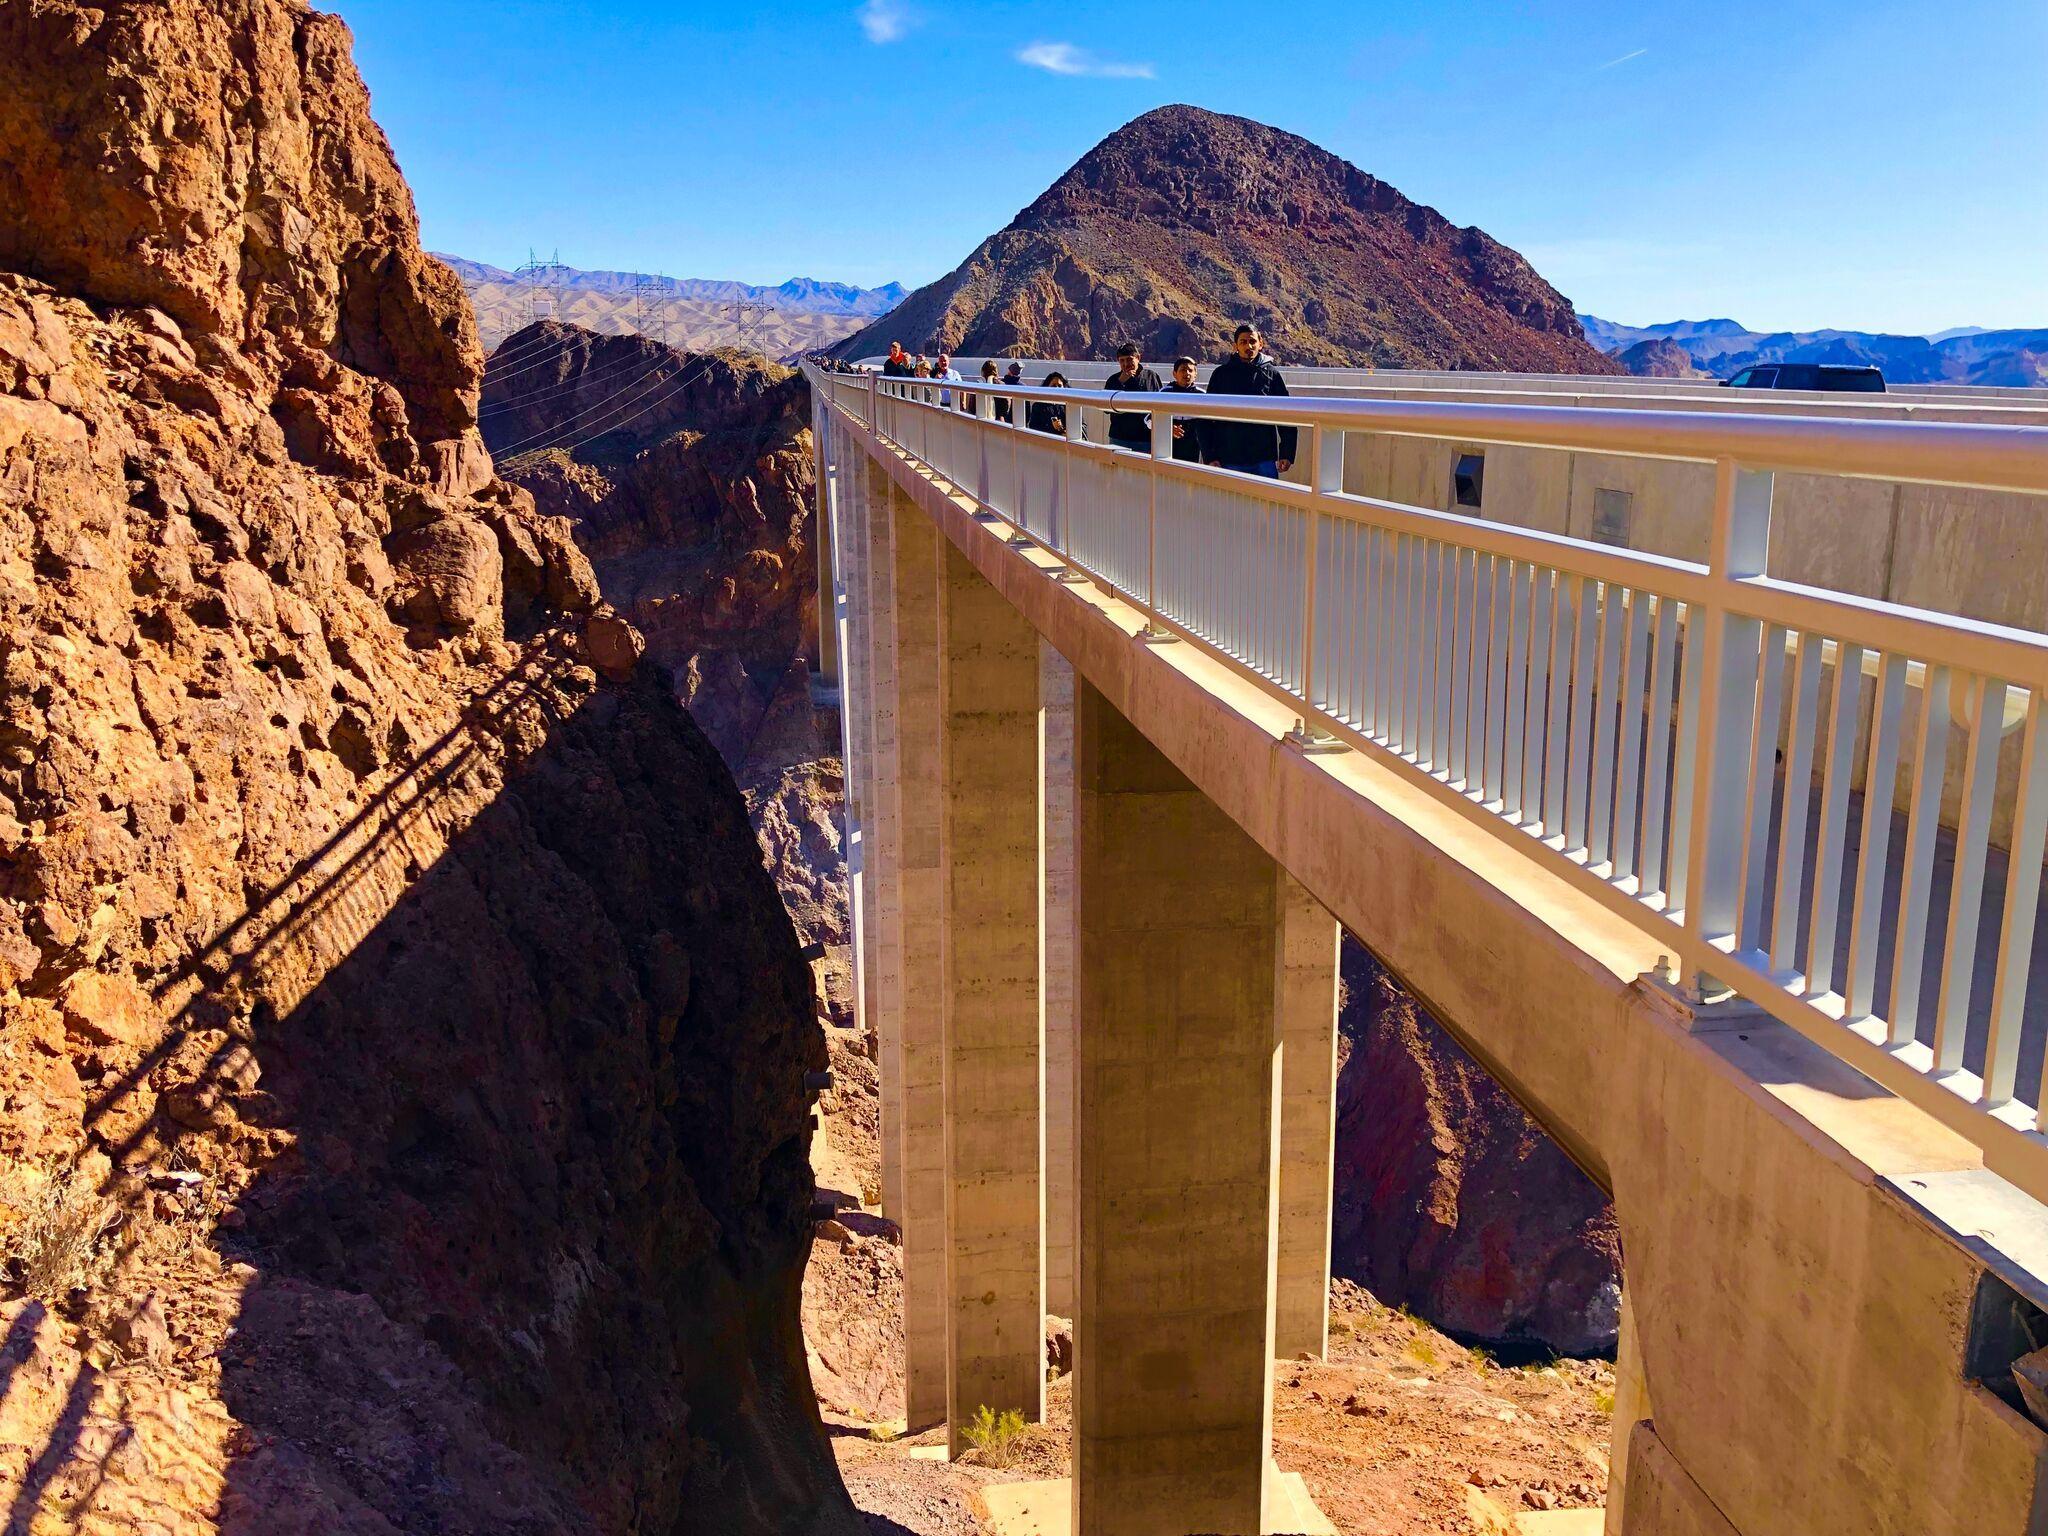 Hoover dam tours in 2020 las vegas tours las vegas